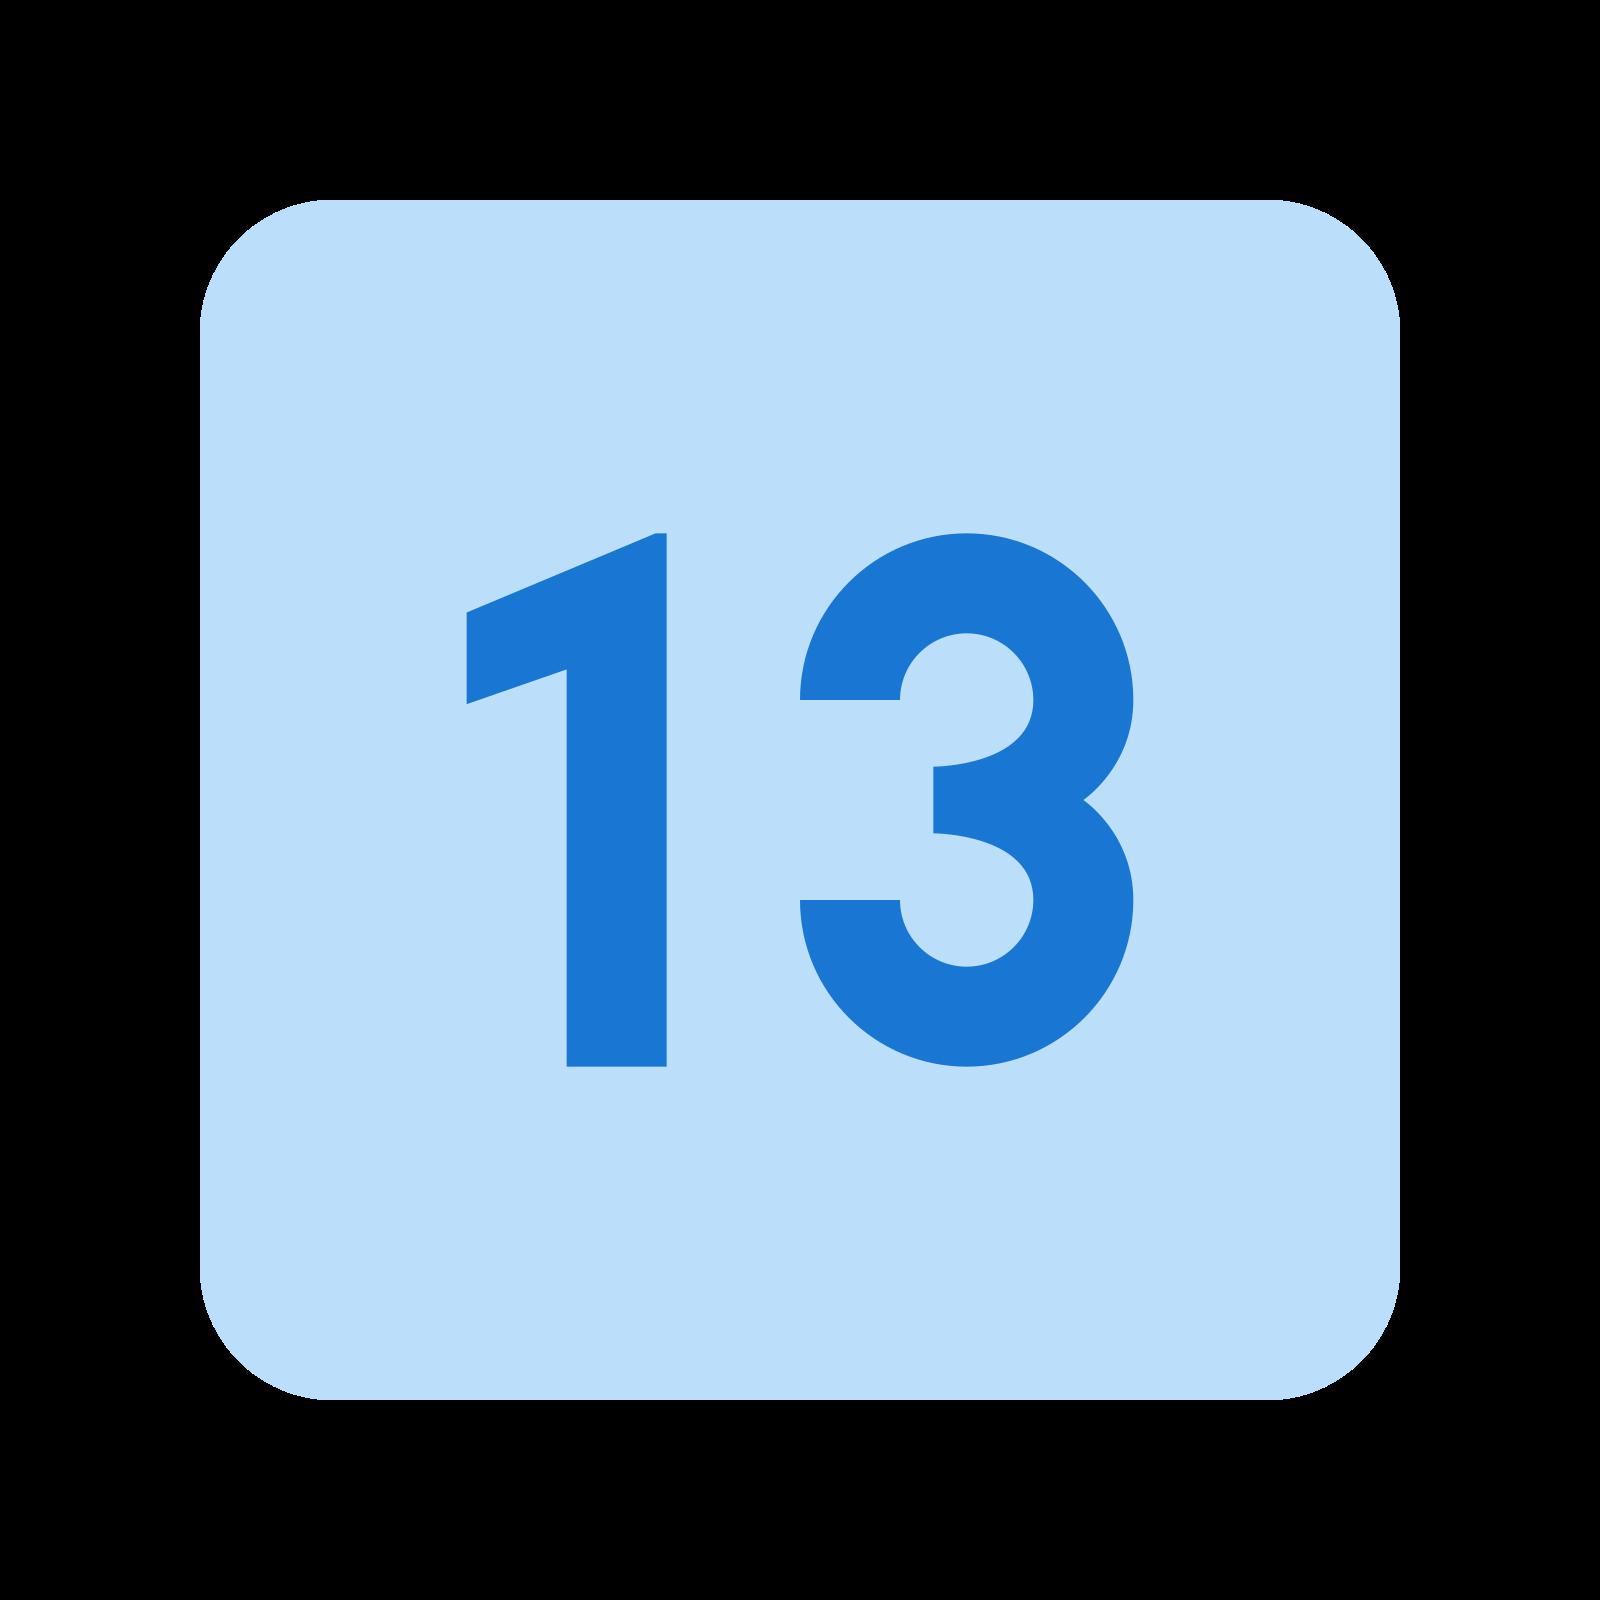 13 icon